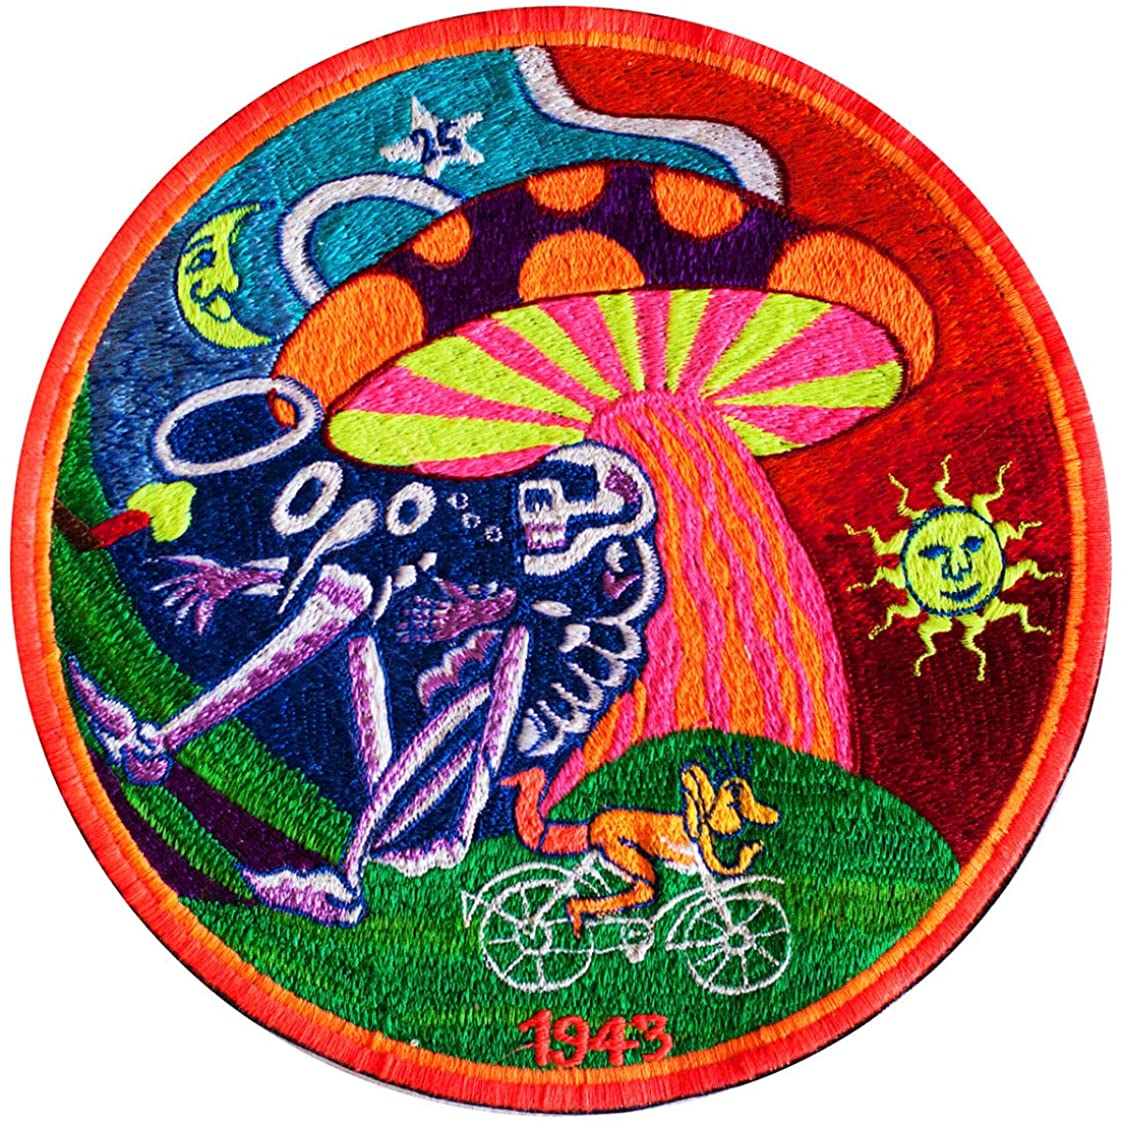 ImZauberwald Bicycleday Shroom ~7 inch UV glowing Grateful LSD psychedelic patch